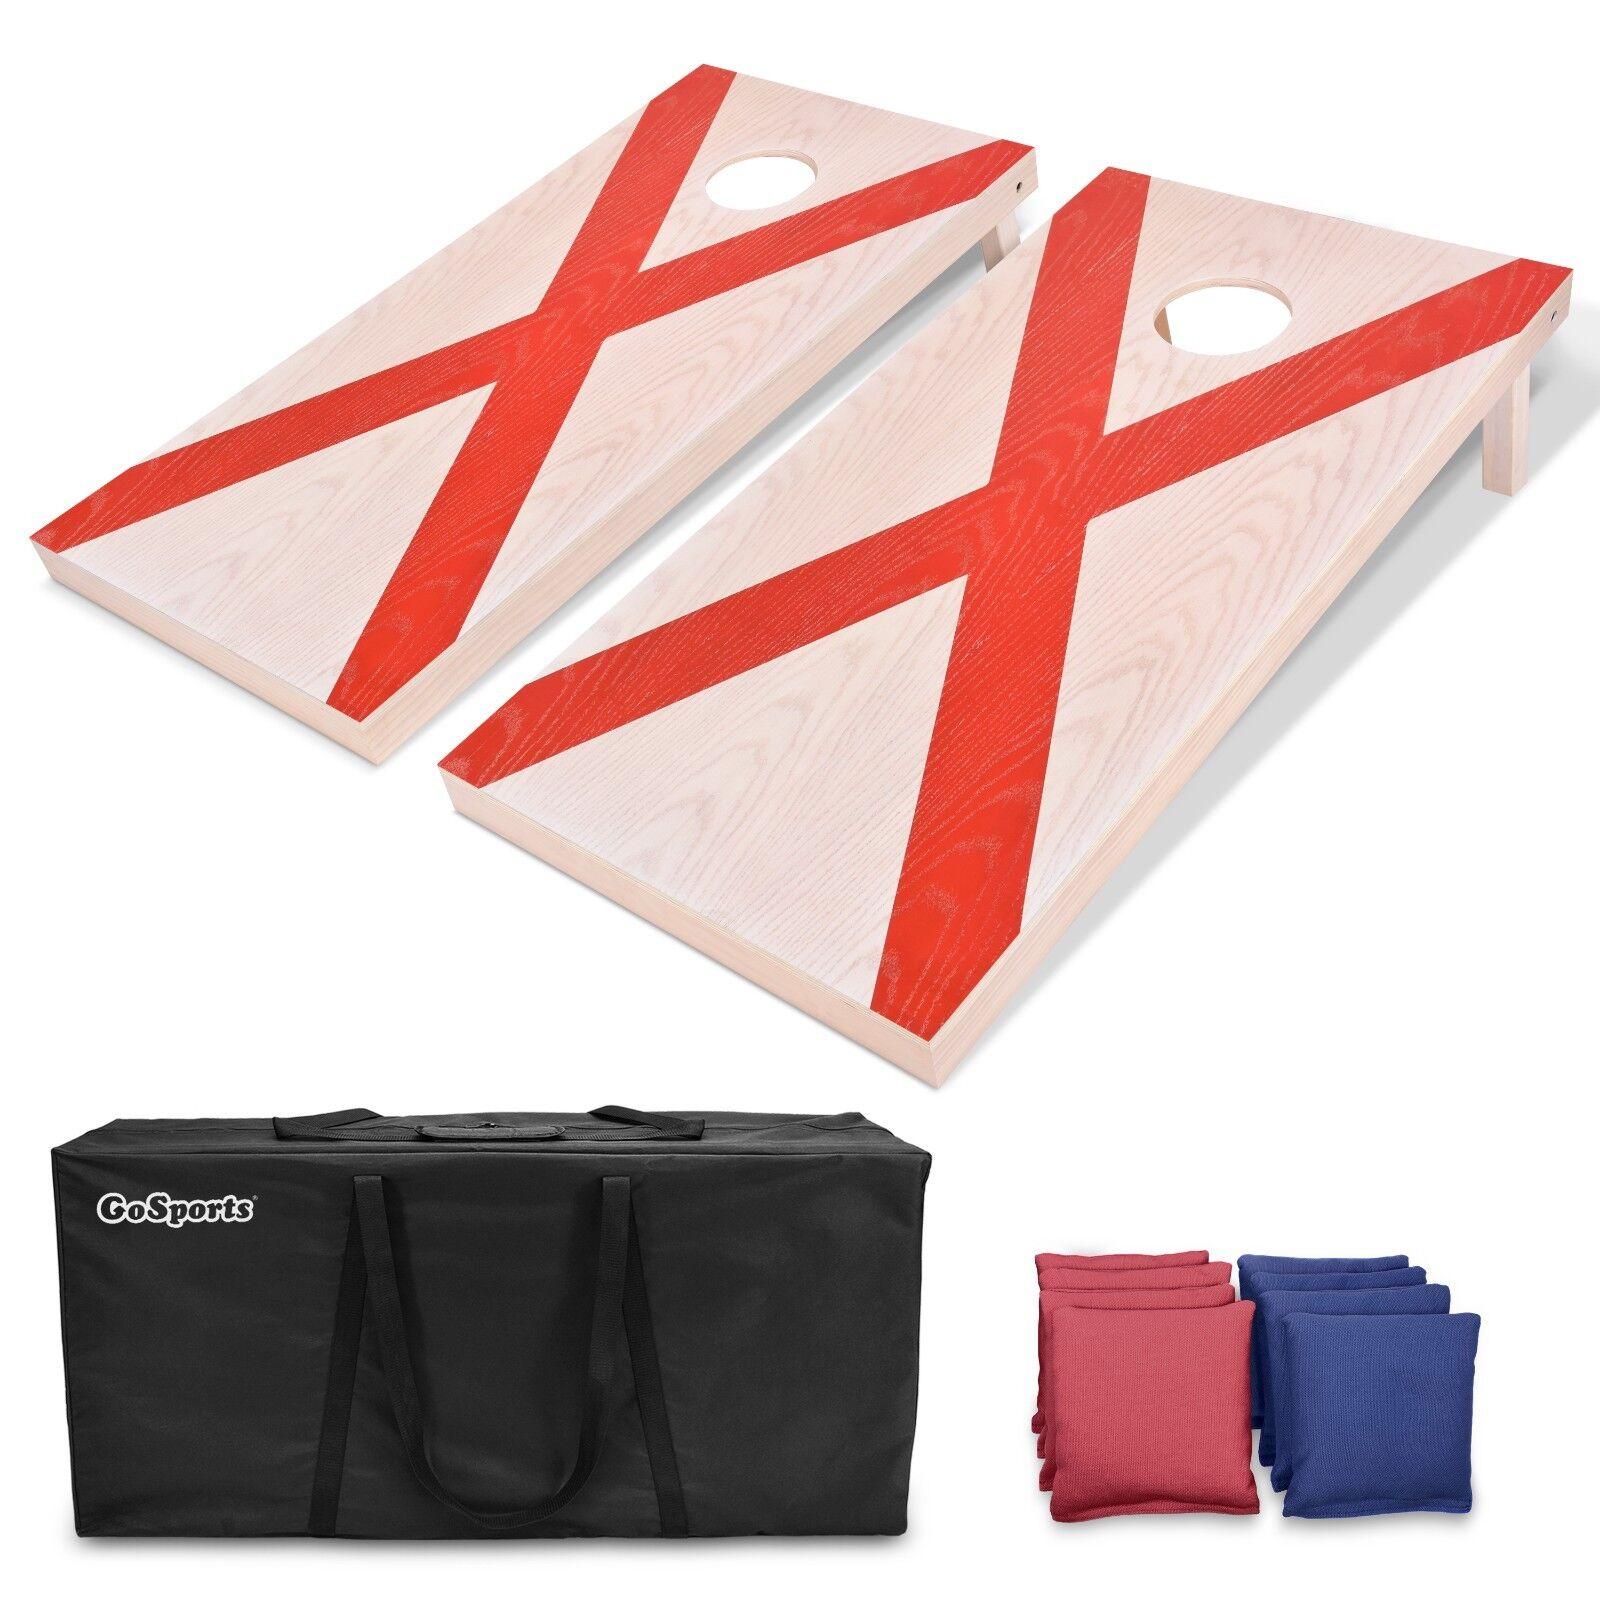 GoSports Alabama Flag Regulation 4'x2' Solid Wood Bean Bag Toss Set